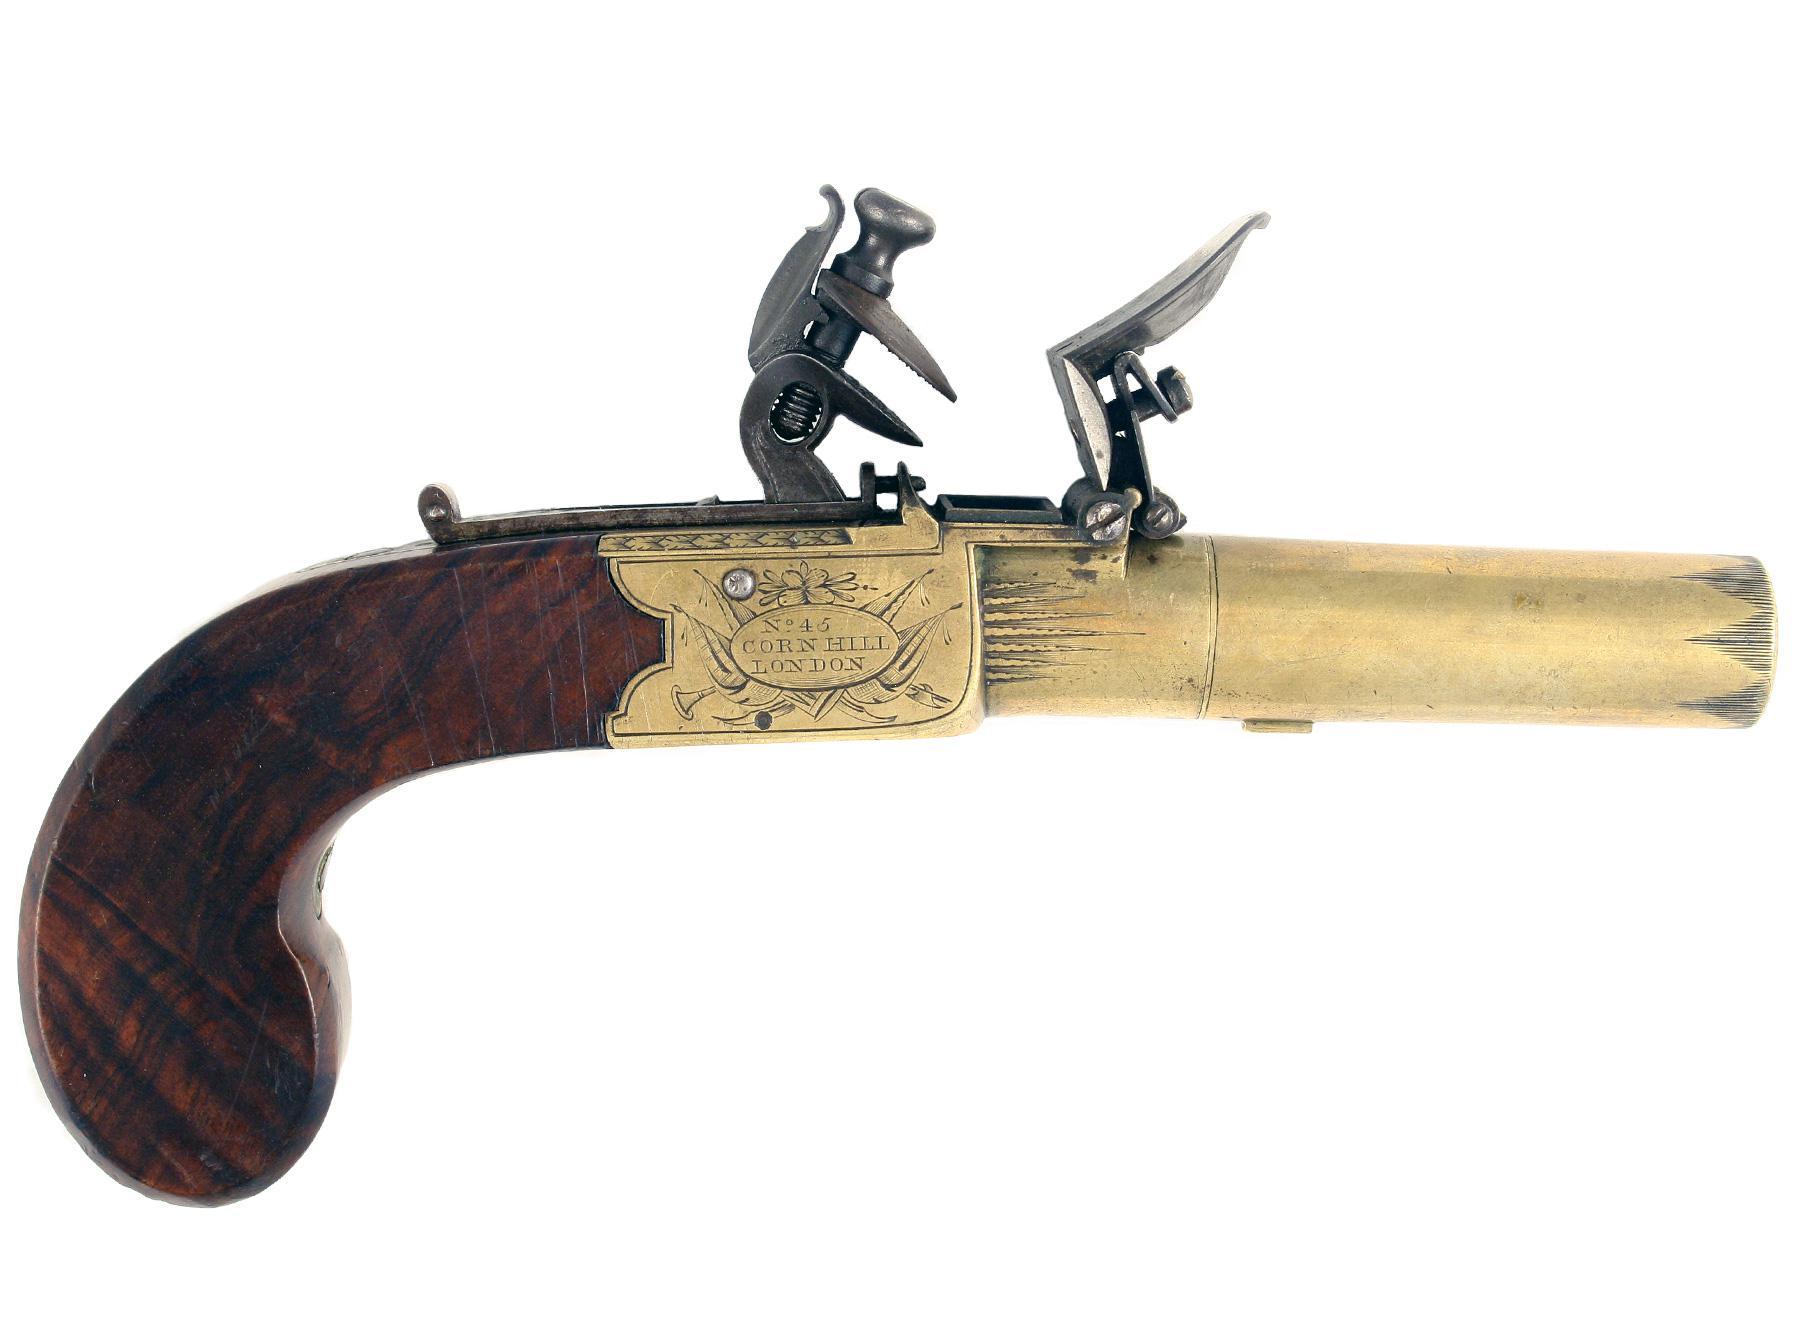 A Large Box-Lock Pistol